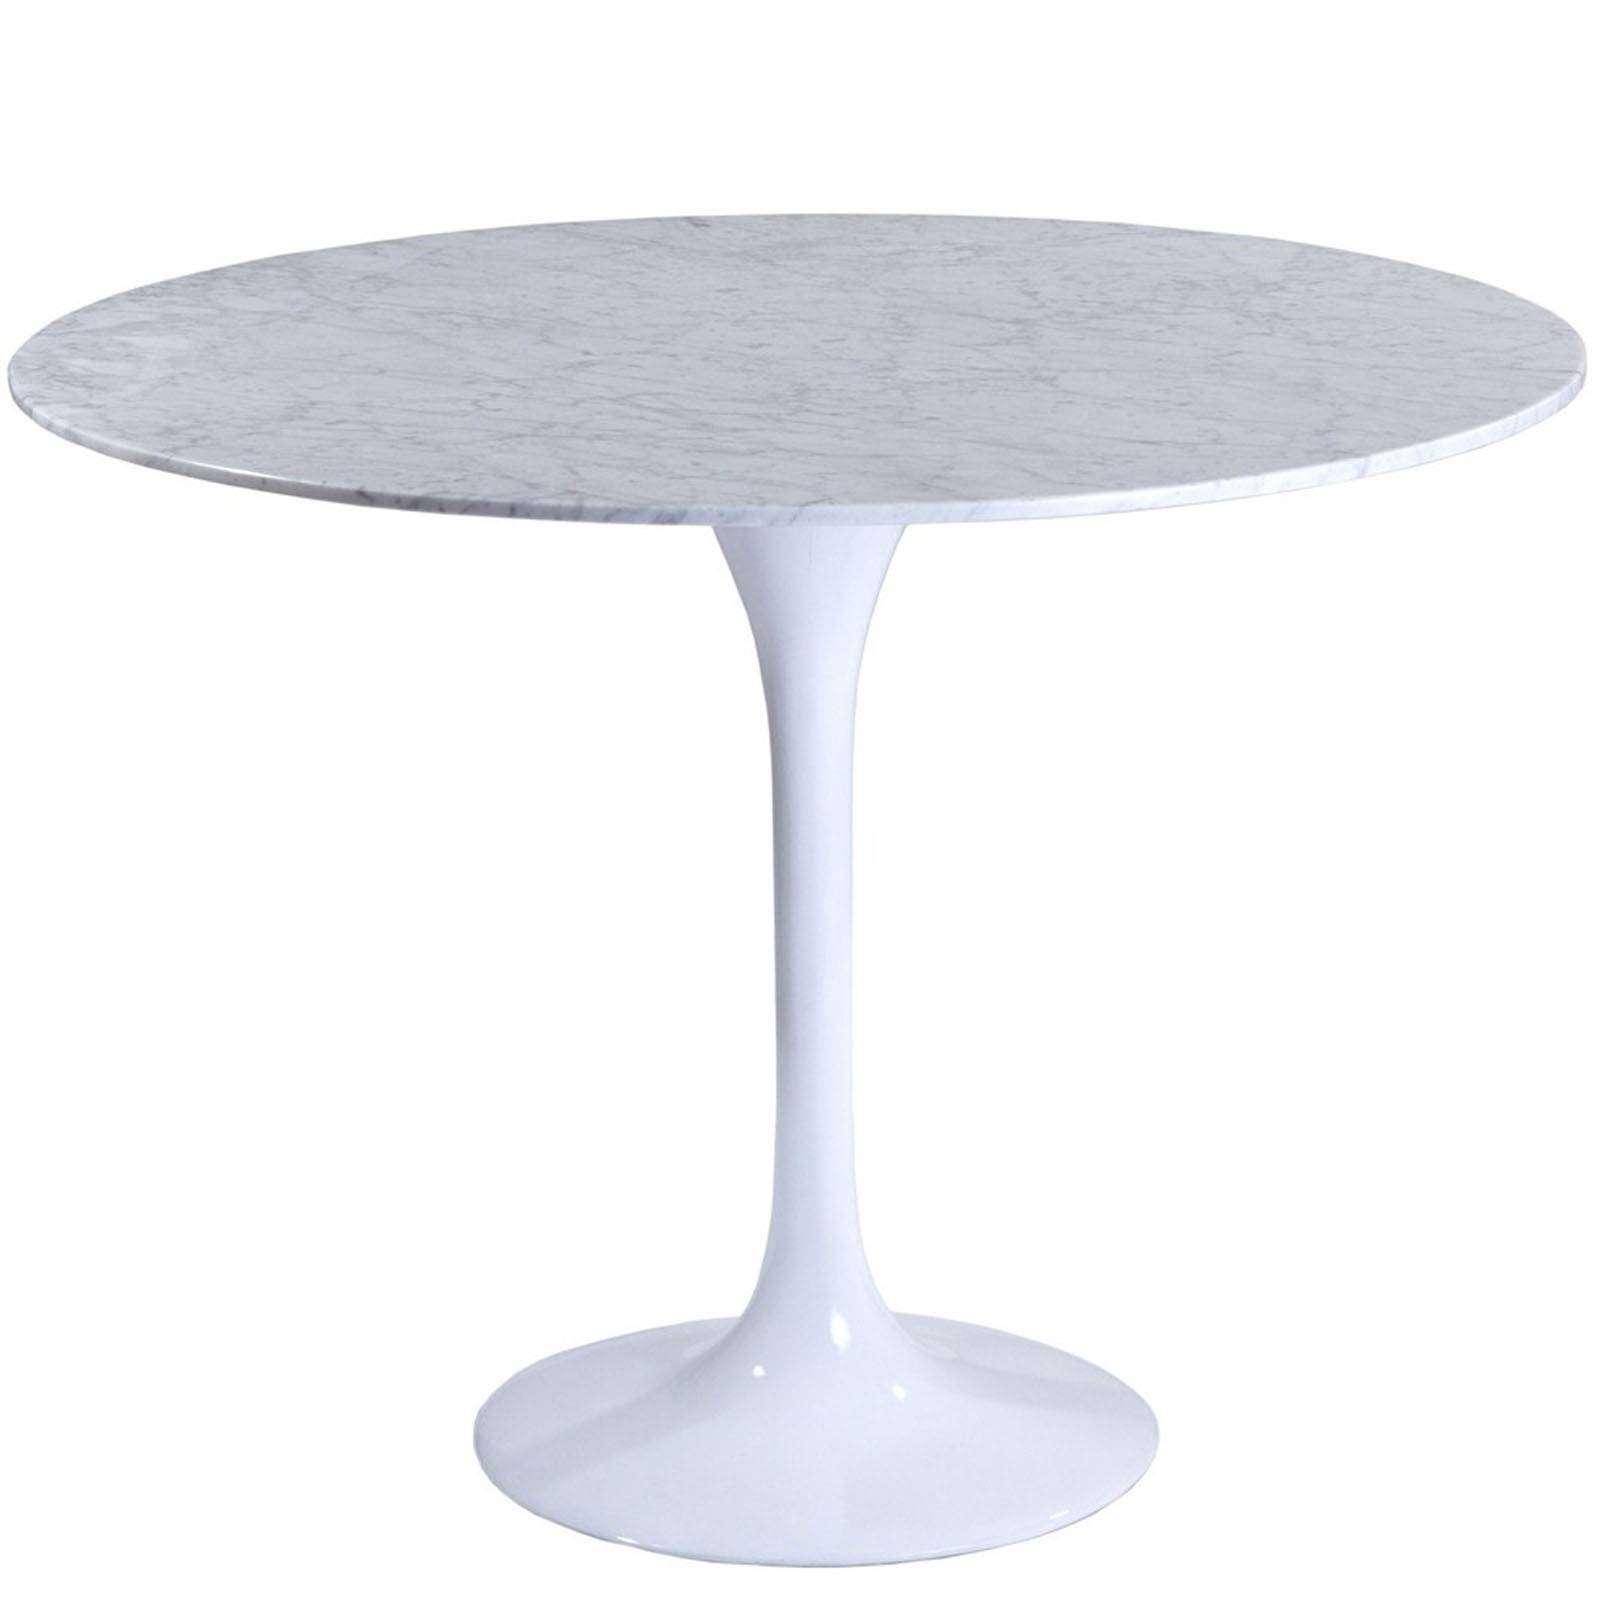 Eero saarinen style tulip table marble 36 for Tulip dining table